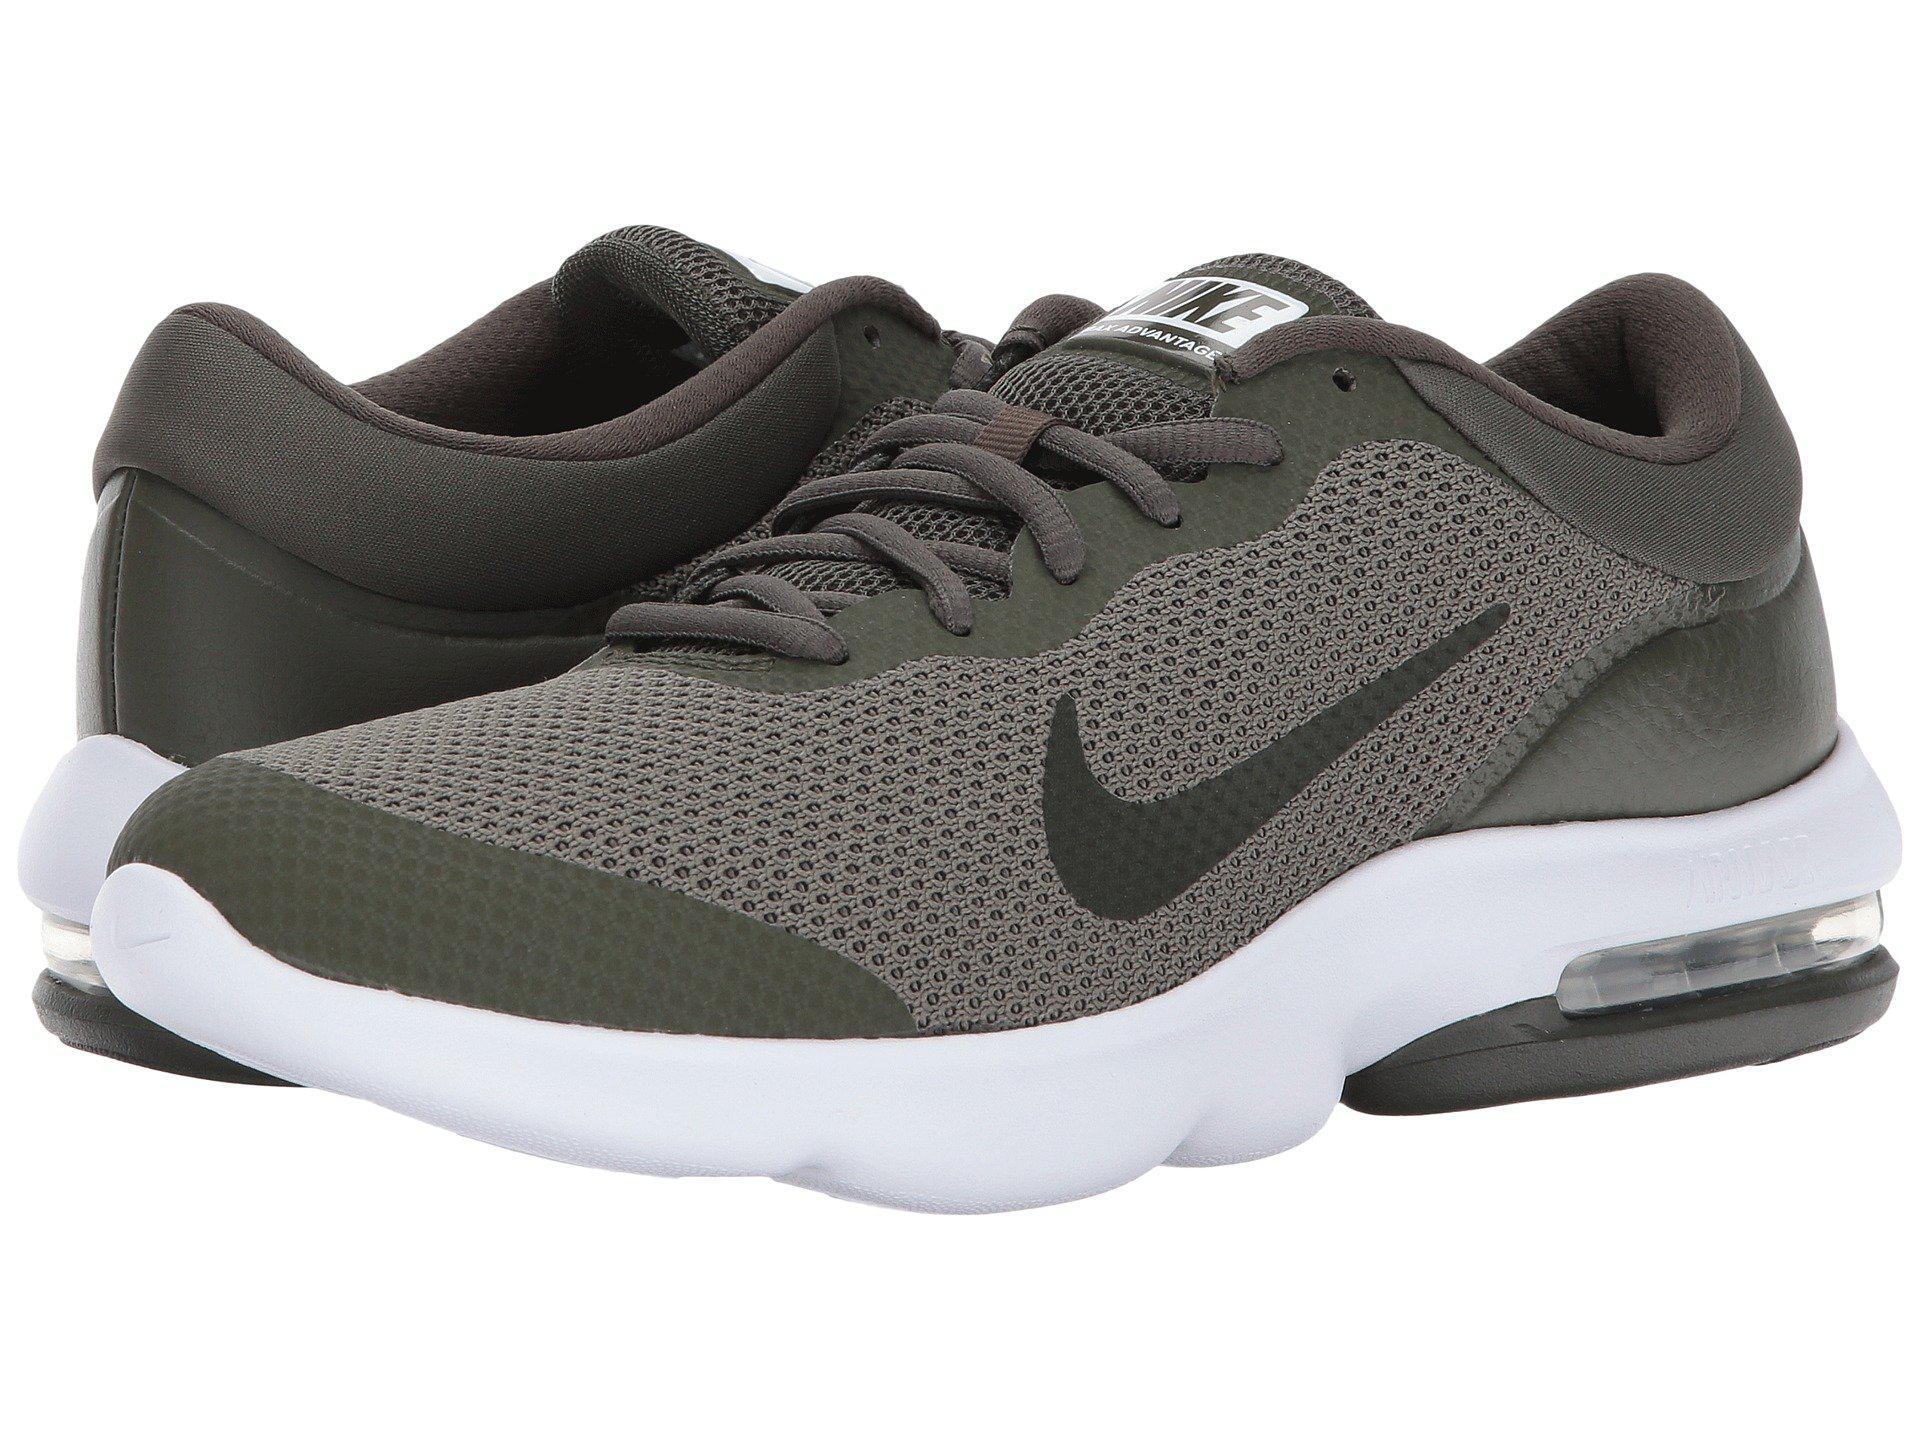 9bdd321e301 Lyst - Nike Air Max Advantage for Men - Save 42%